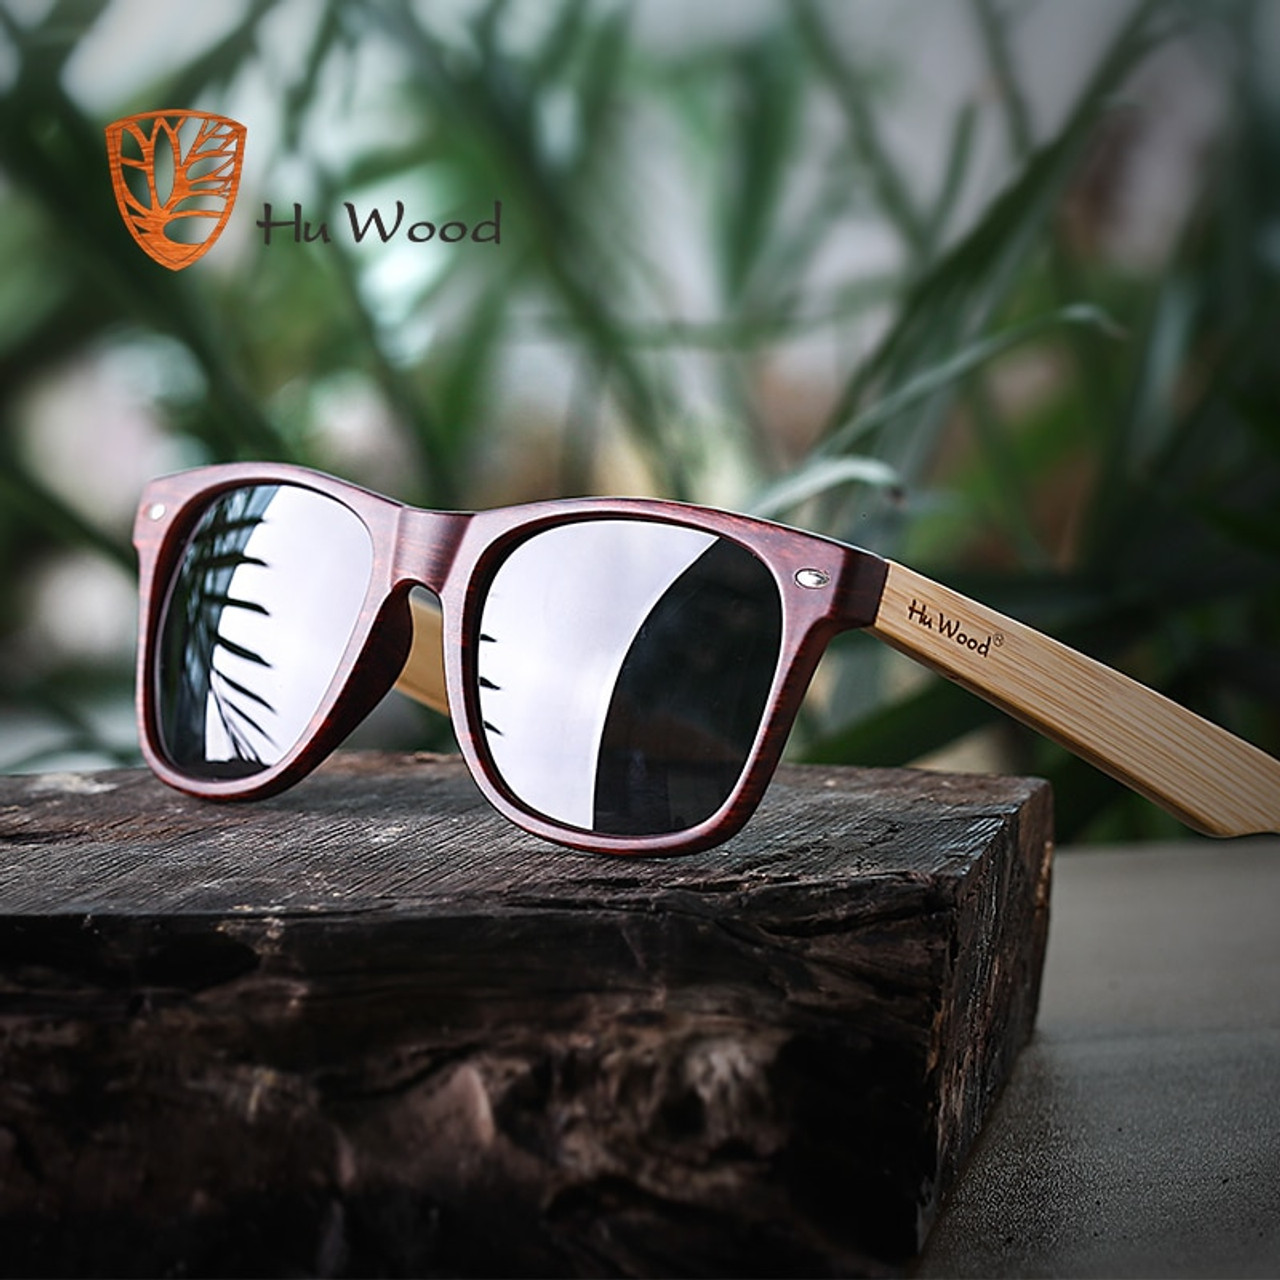 f5cc7a24e3929 HU WOOD 2018 DESIGN Men Women Classic Retro Rivet Polarized Sunglasses 100% UV  Protection bamboo Sun Glasses GRS8004 - OnshopDeals.Com